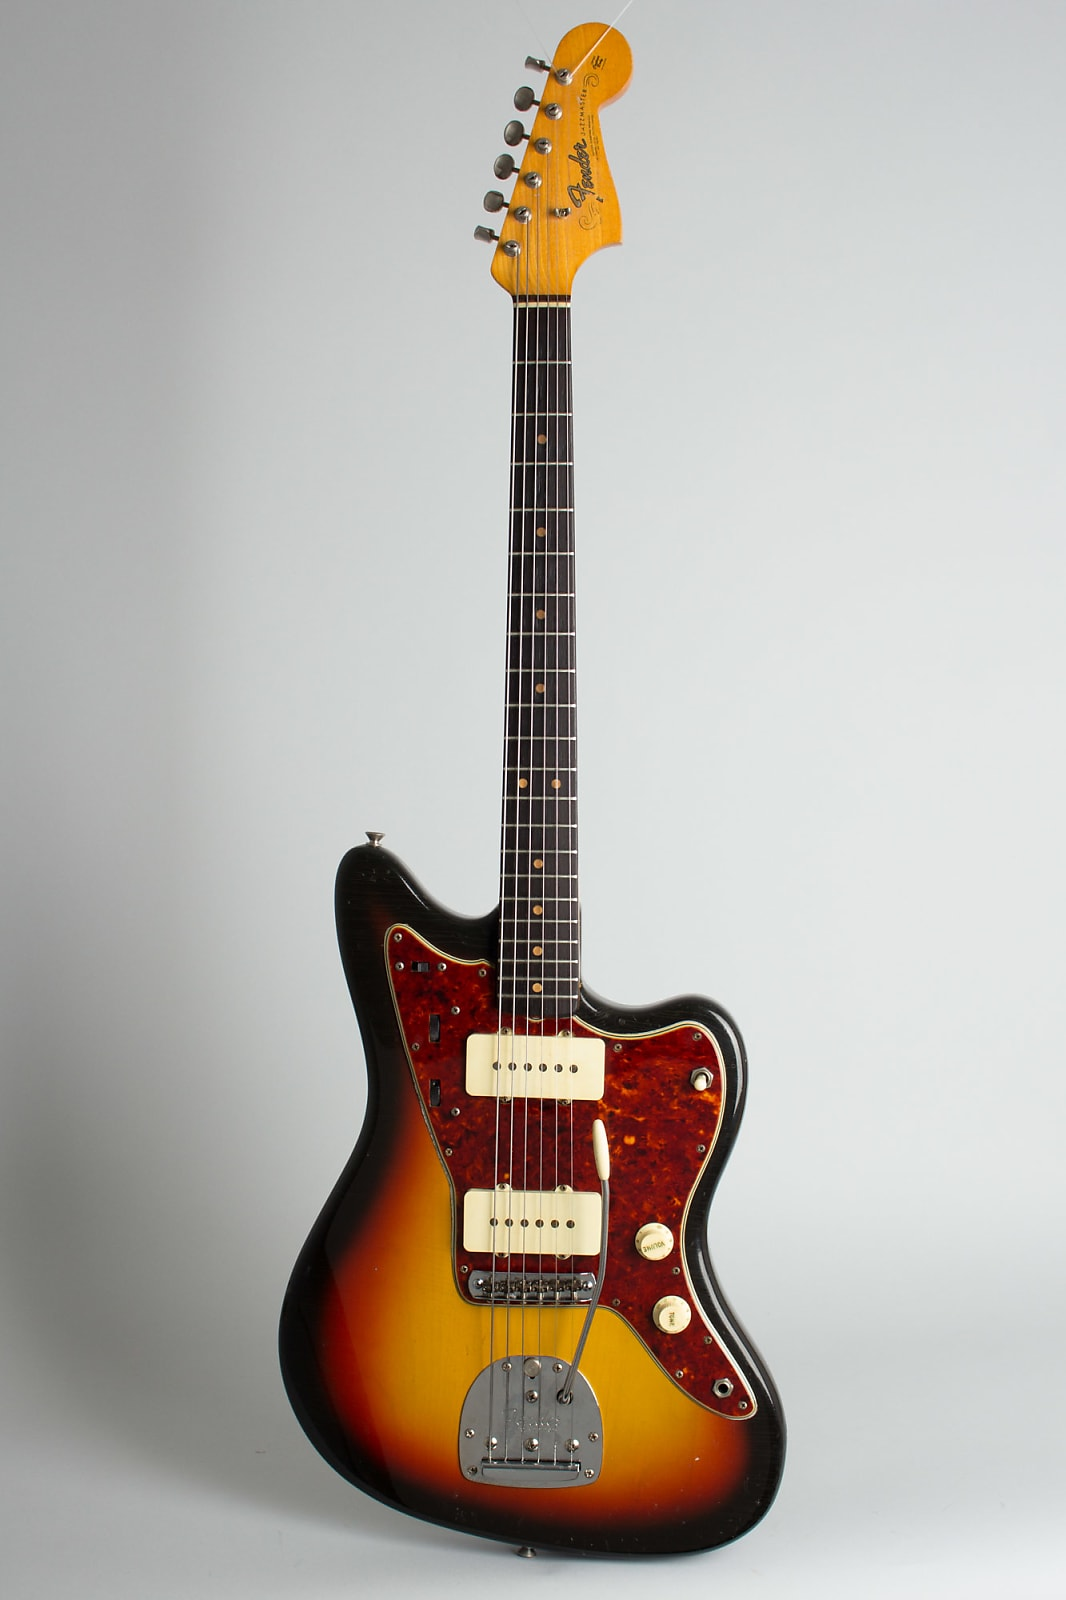 Fender  Jazzmaster Solid Body Electric Guitar (1965), ser. #L-70616, black tolex hard shell case.